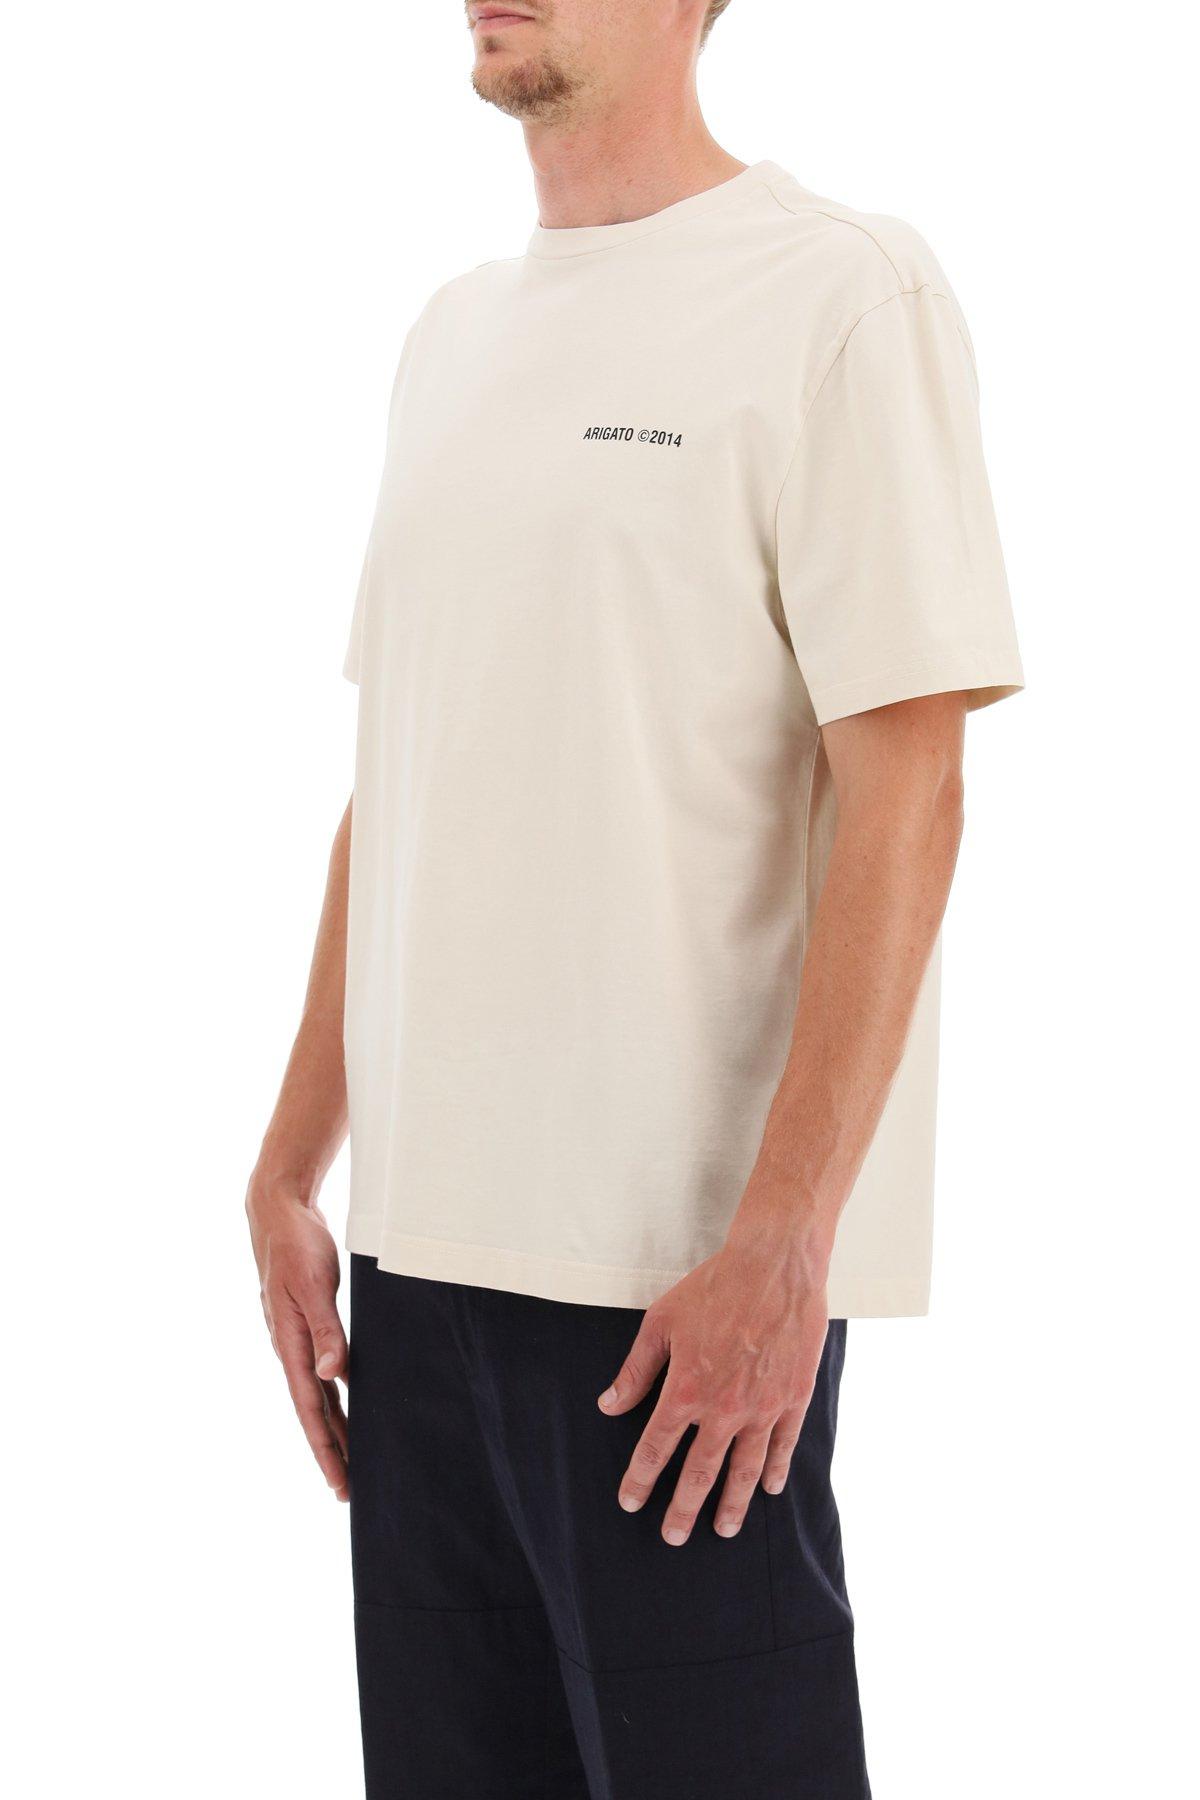 Axel arigato t-shirt london con stampa logo